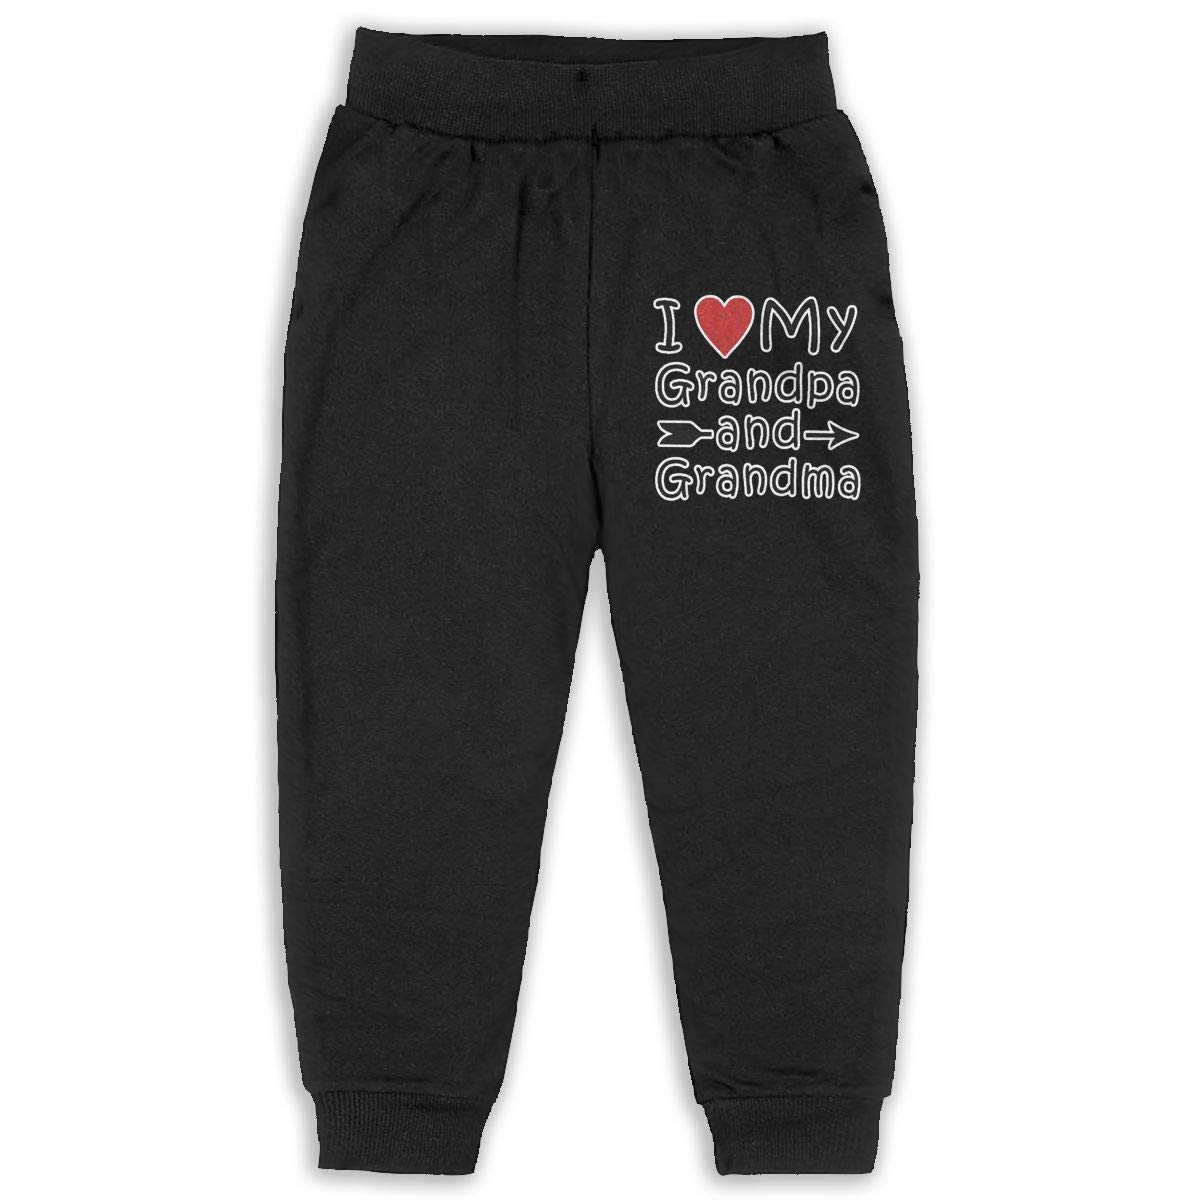 I Love My Grandpa and Grandma Sweatpants for Boys /& Girls Fleece Active Joggers Elastic Pants